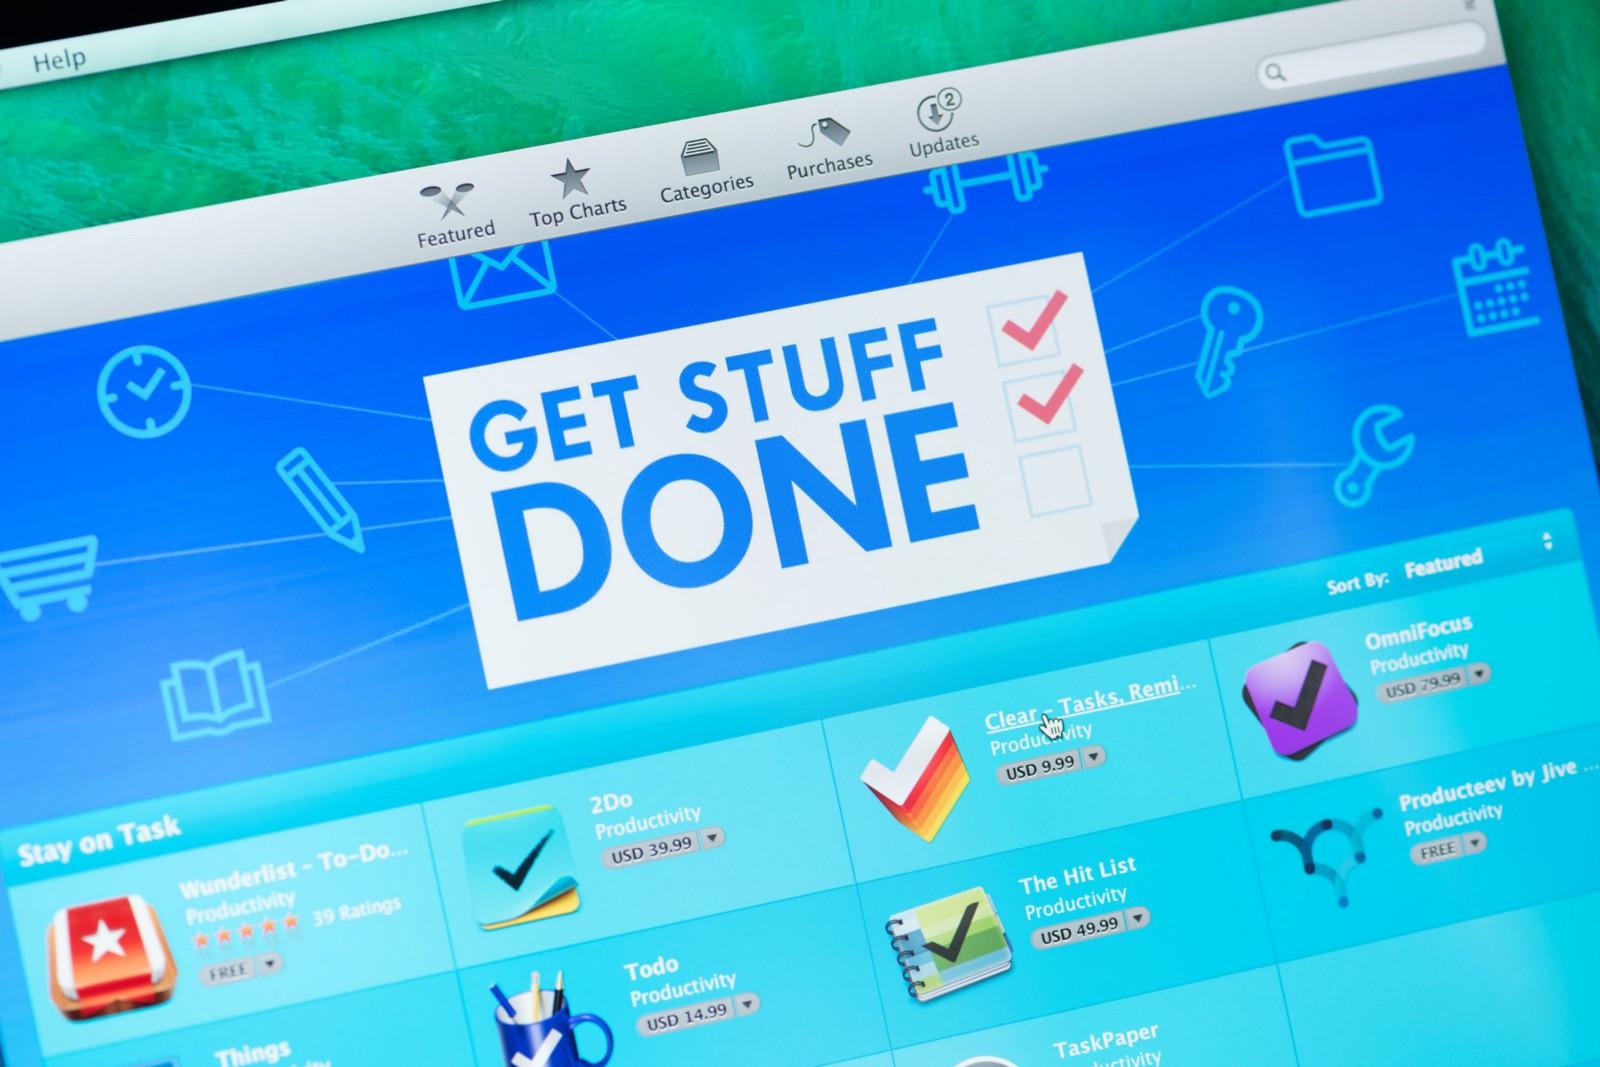 Productivity eTools: Be Organized & Get Stuff Done 5/6